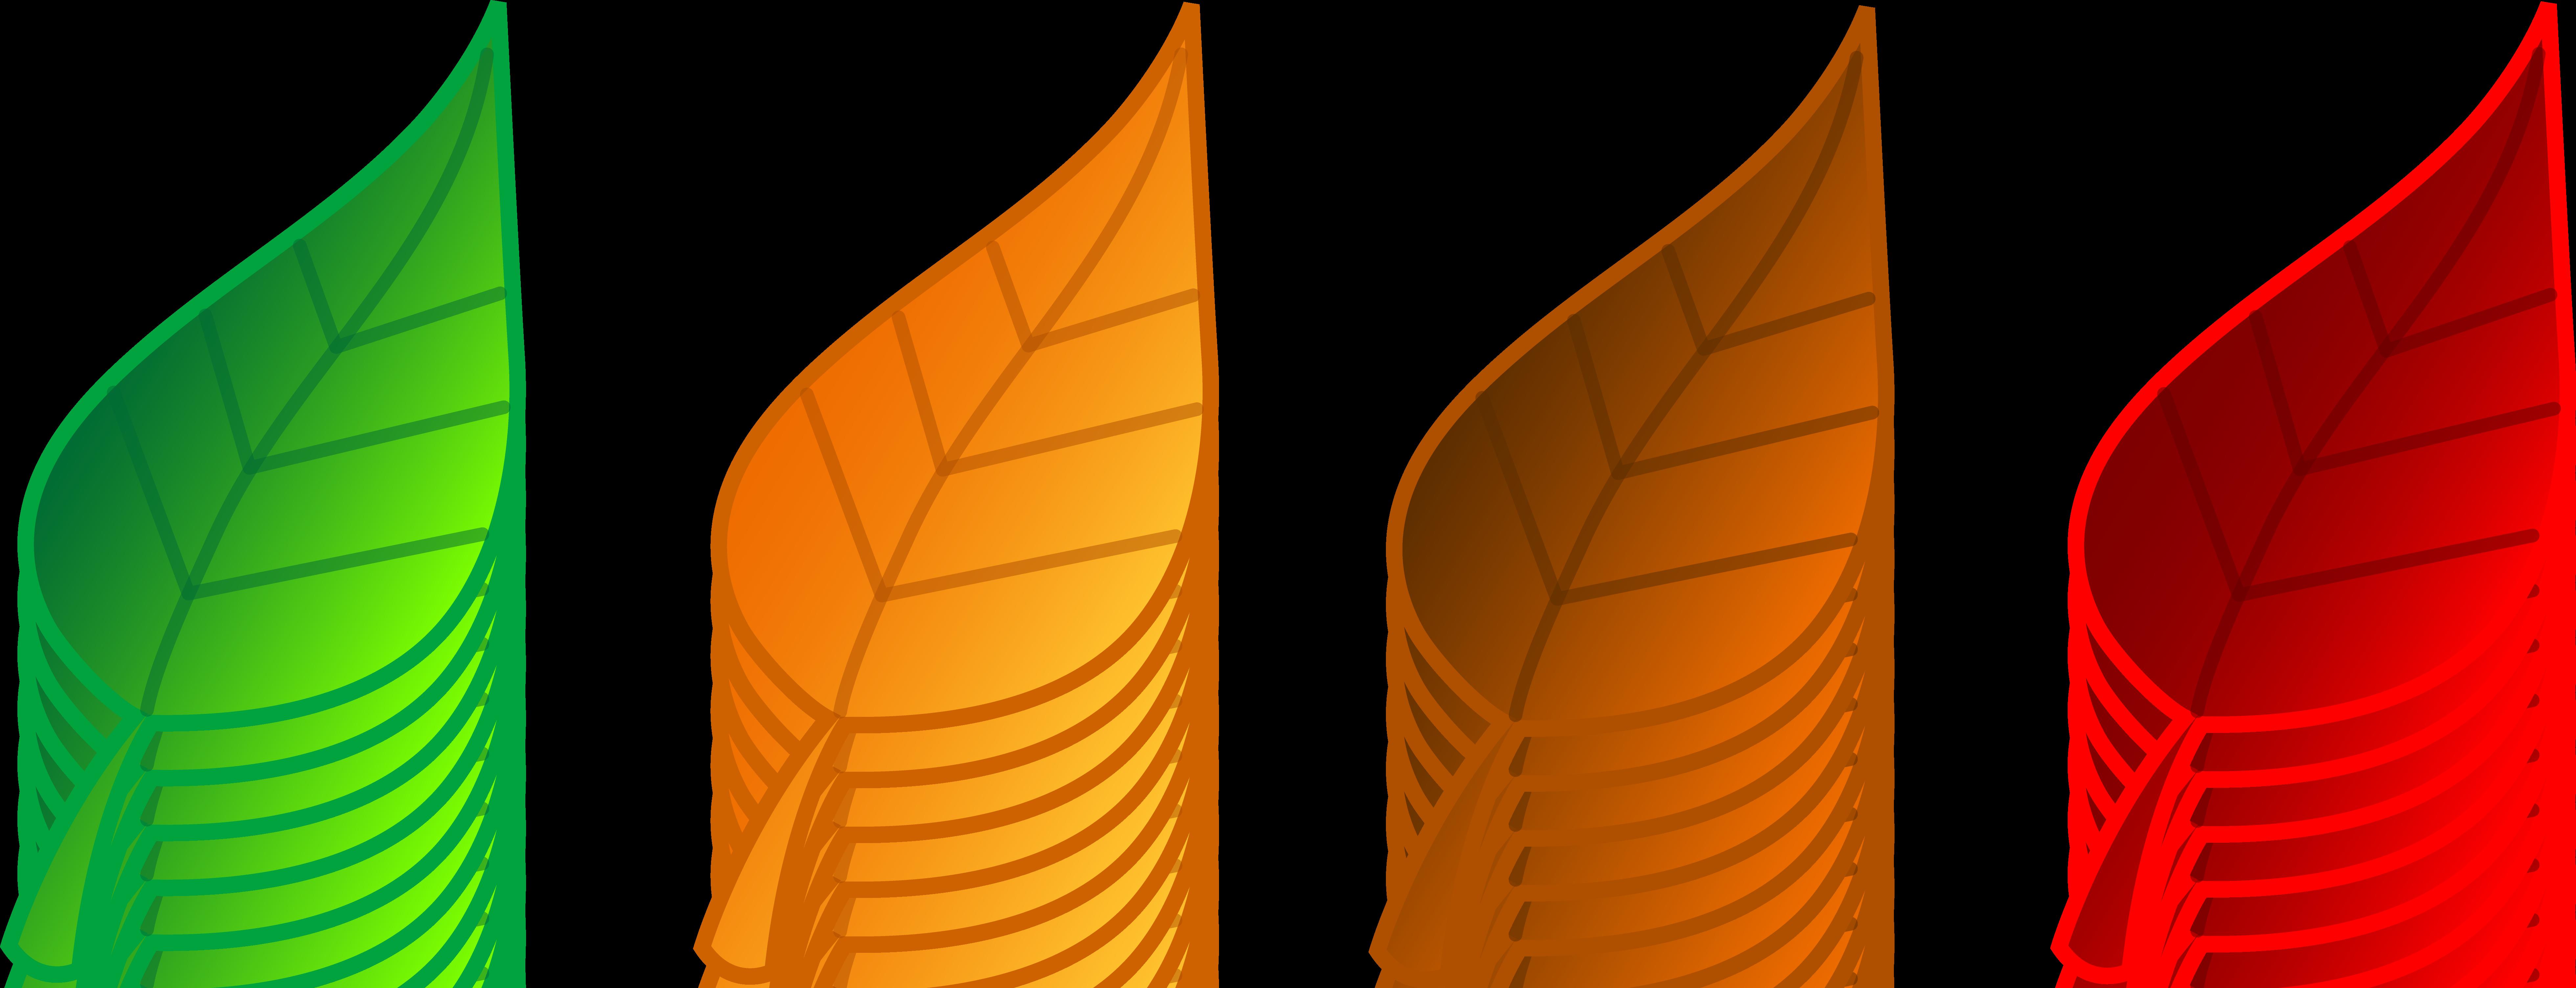 7840x3006 Fall Leaf Clip Art 4